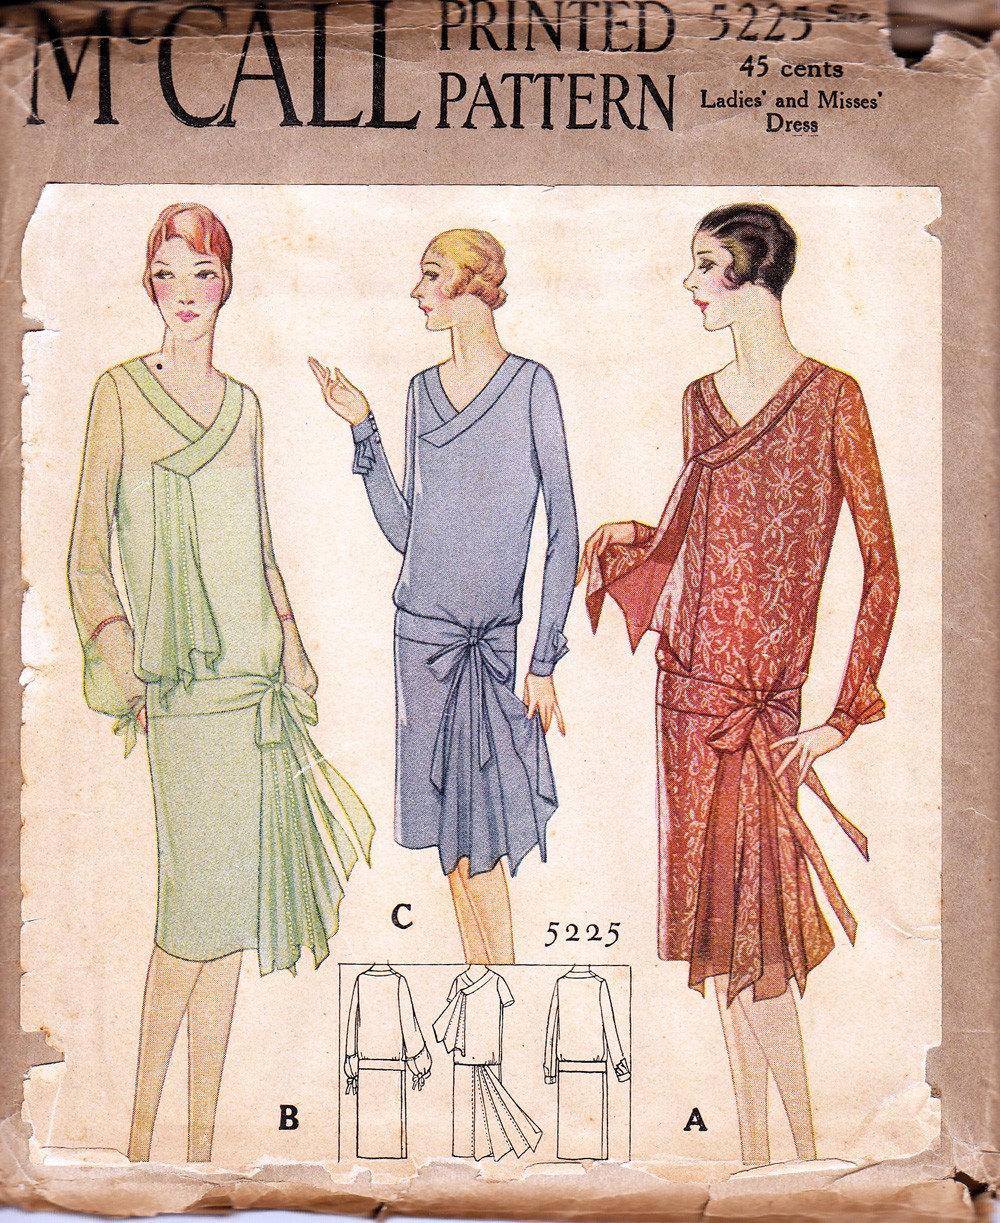 1920s dress patterns the dress shop